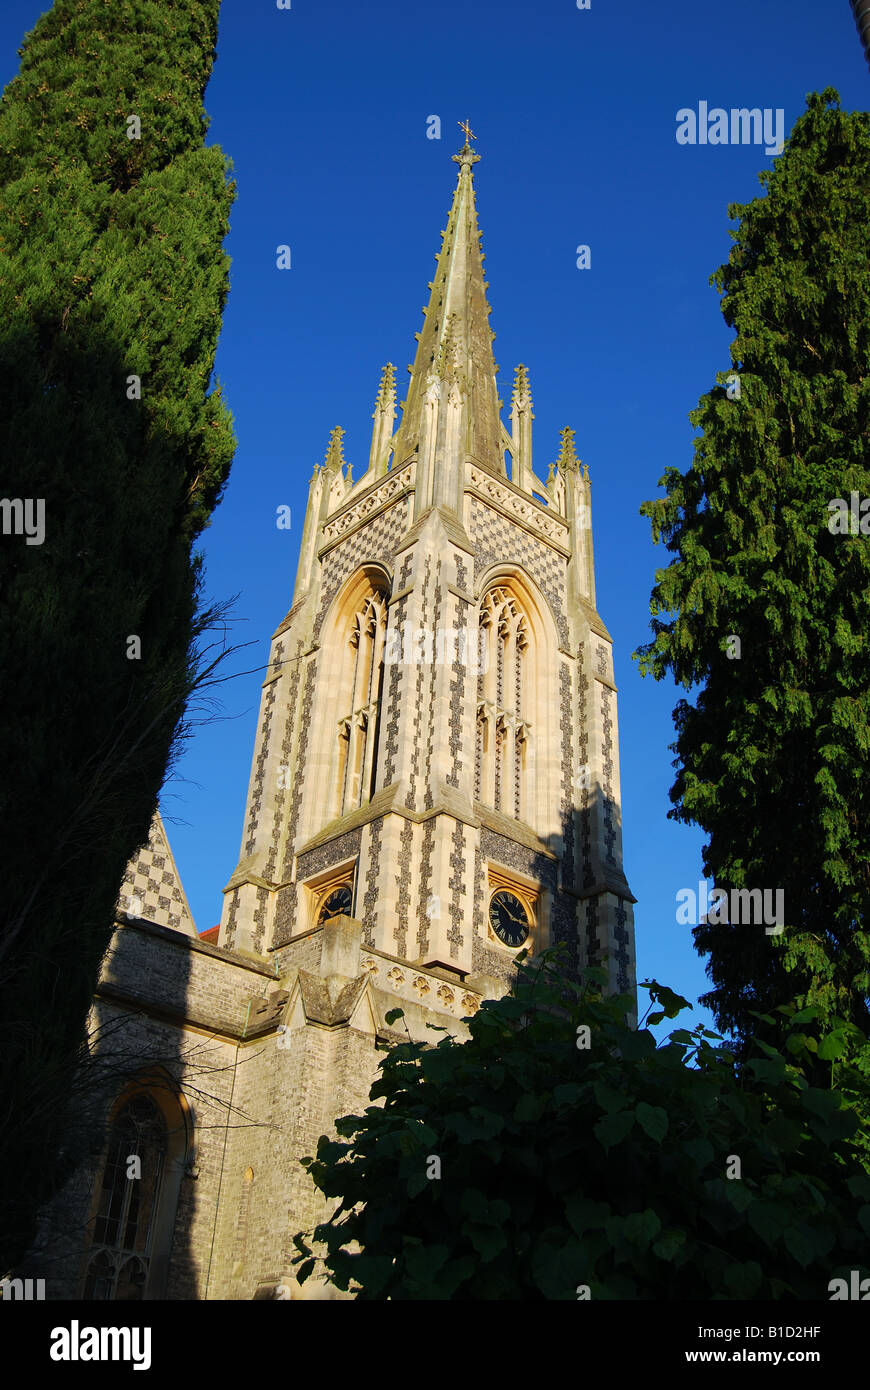 All Saints Church, Marlow, Buckinghamshire, England, United Kingdom - Stock Image